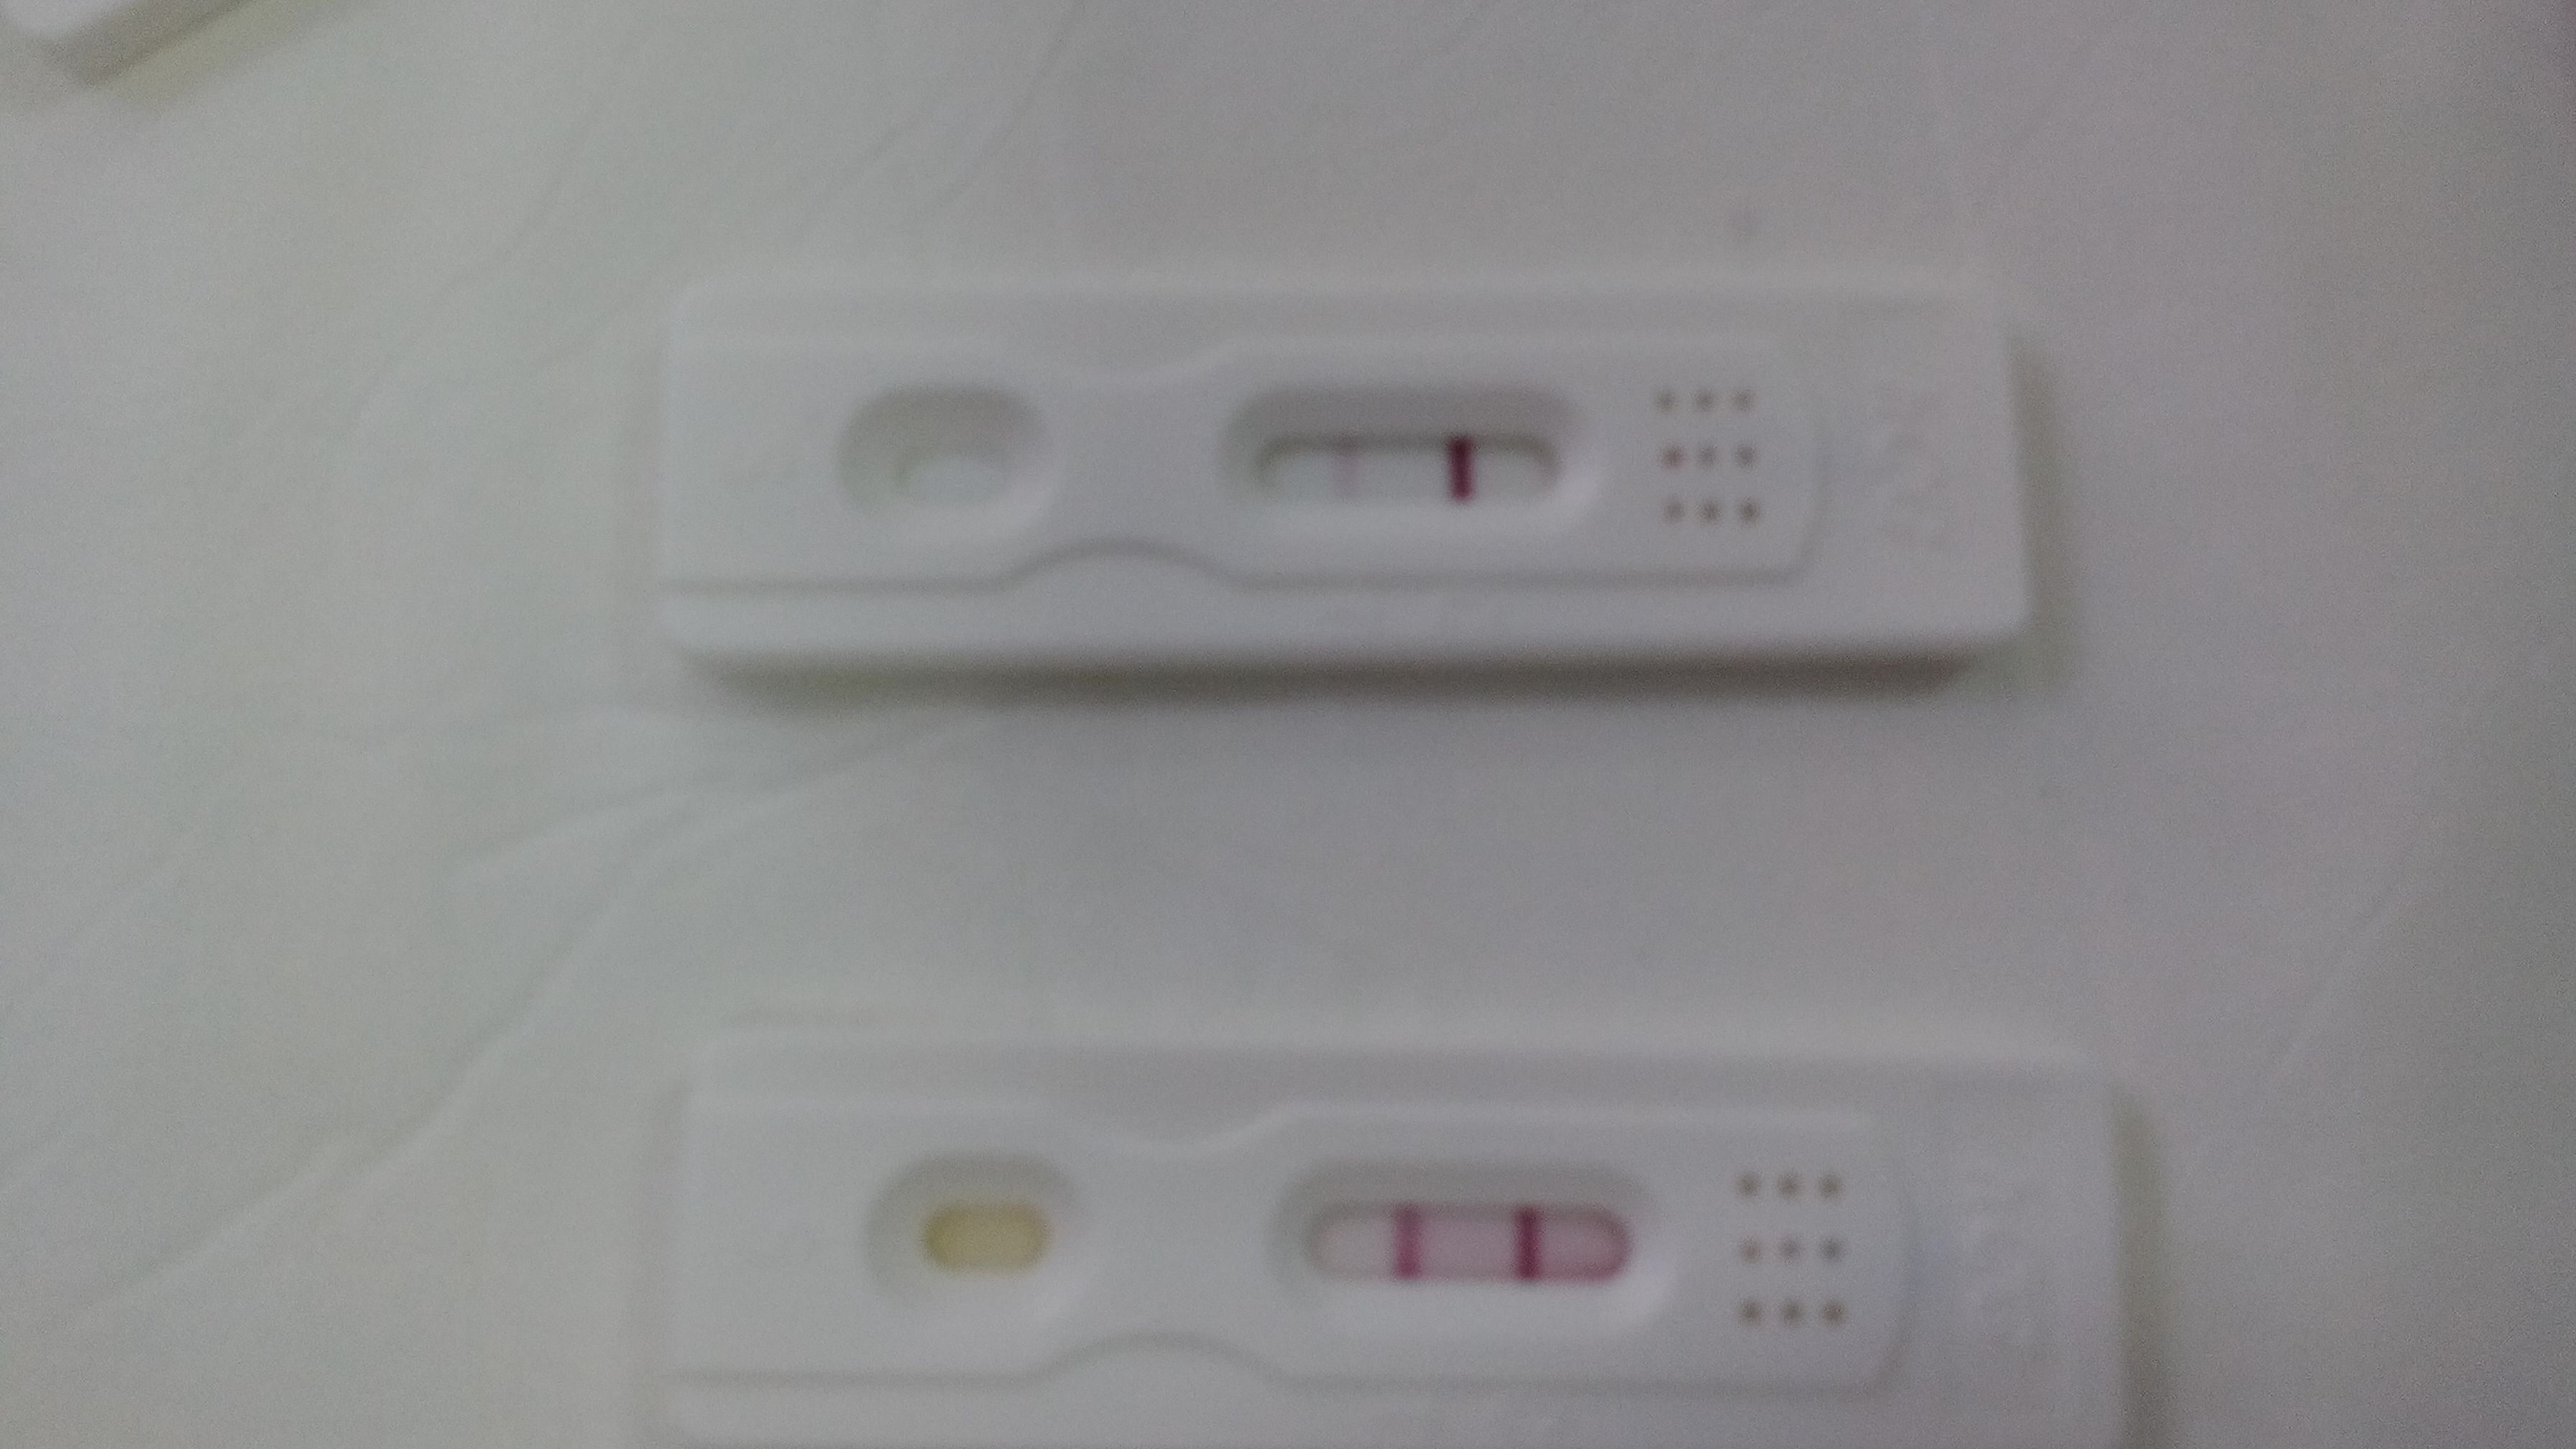 cde9b350c 1. Debil positivo 2.Positivo Test De Embarazo